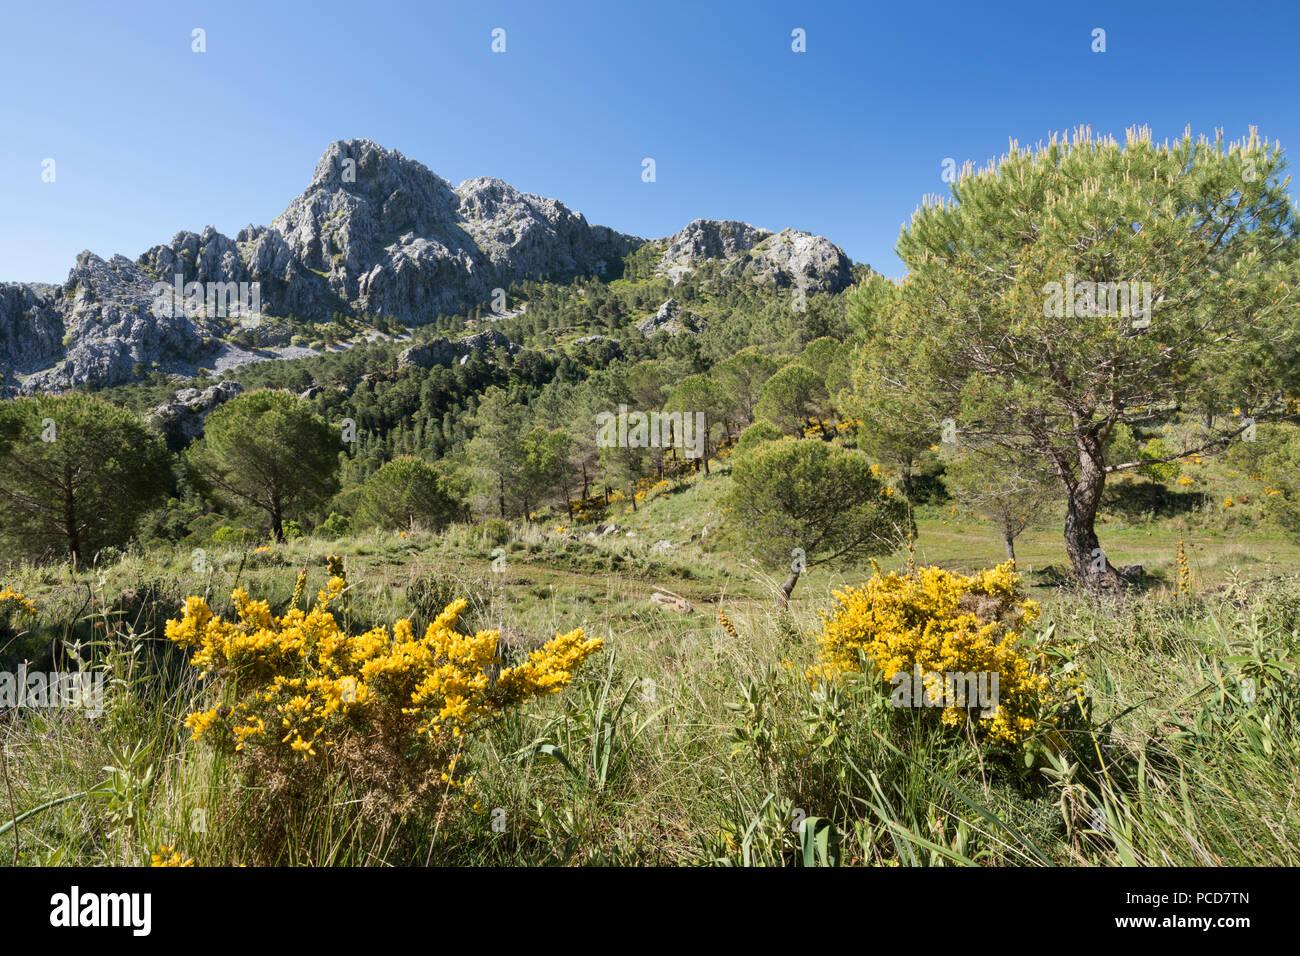 Accidentado paisaje de montaña en primavera, cerca de Grazalema, El Parque Natural Sierra de Grazalema, Andalucia, España, Europa Imagen De Stock